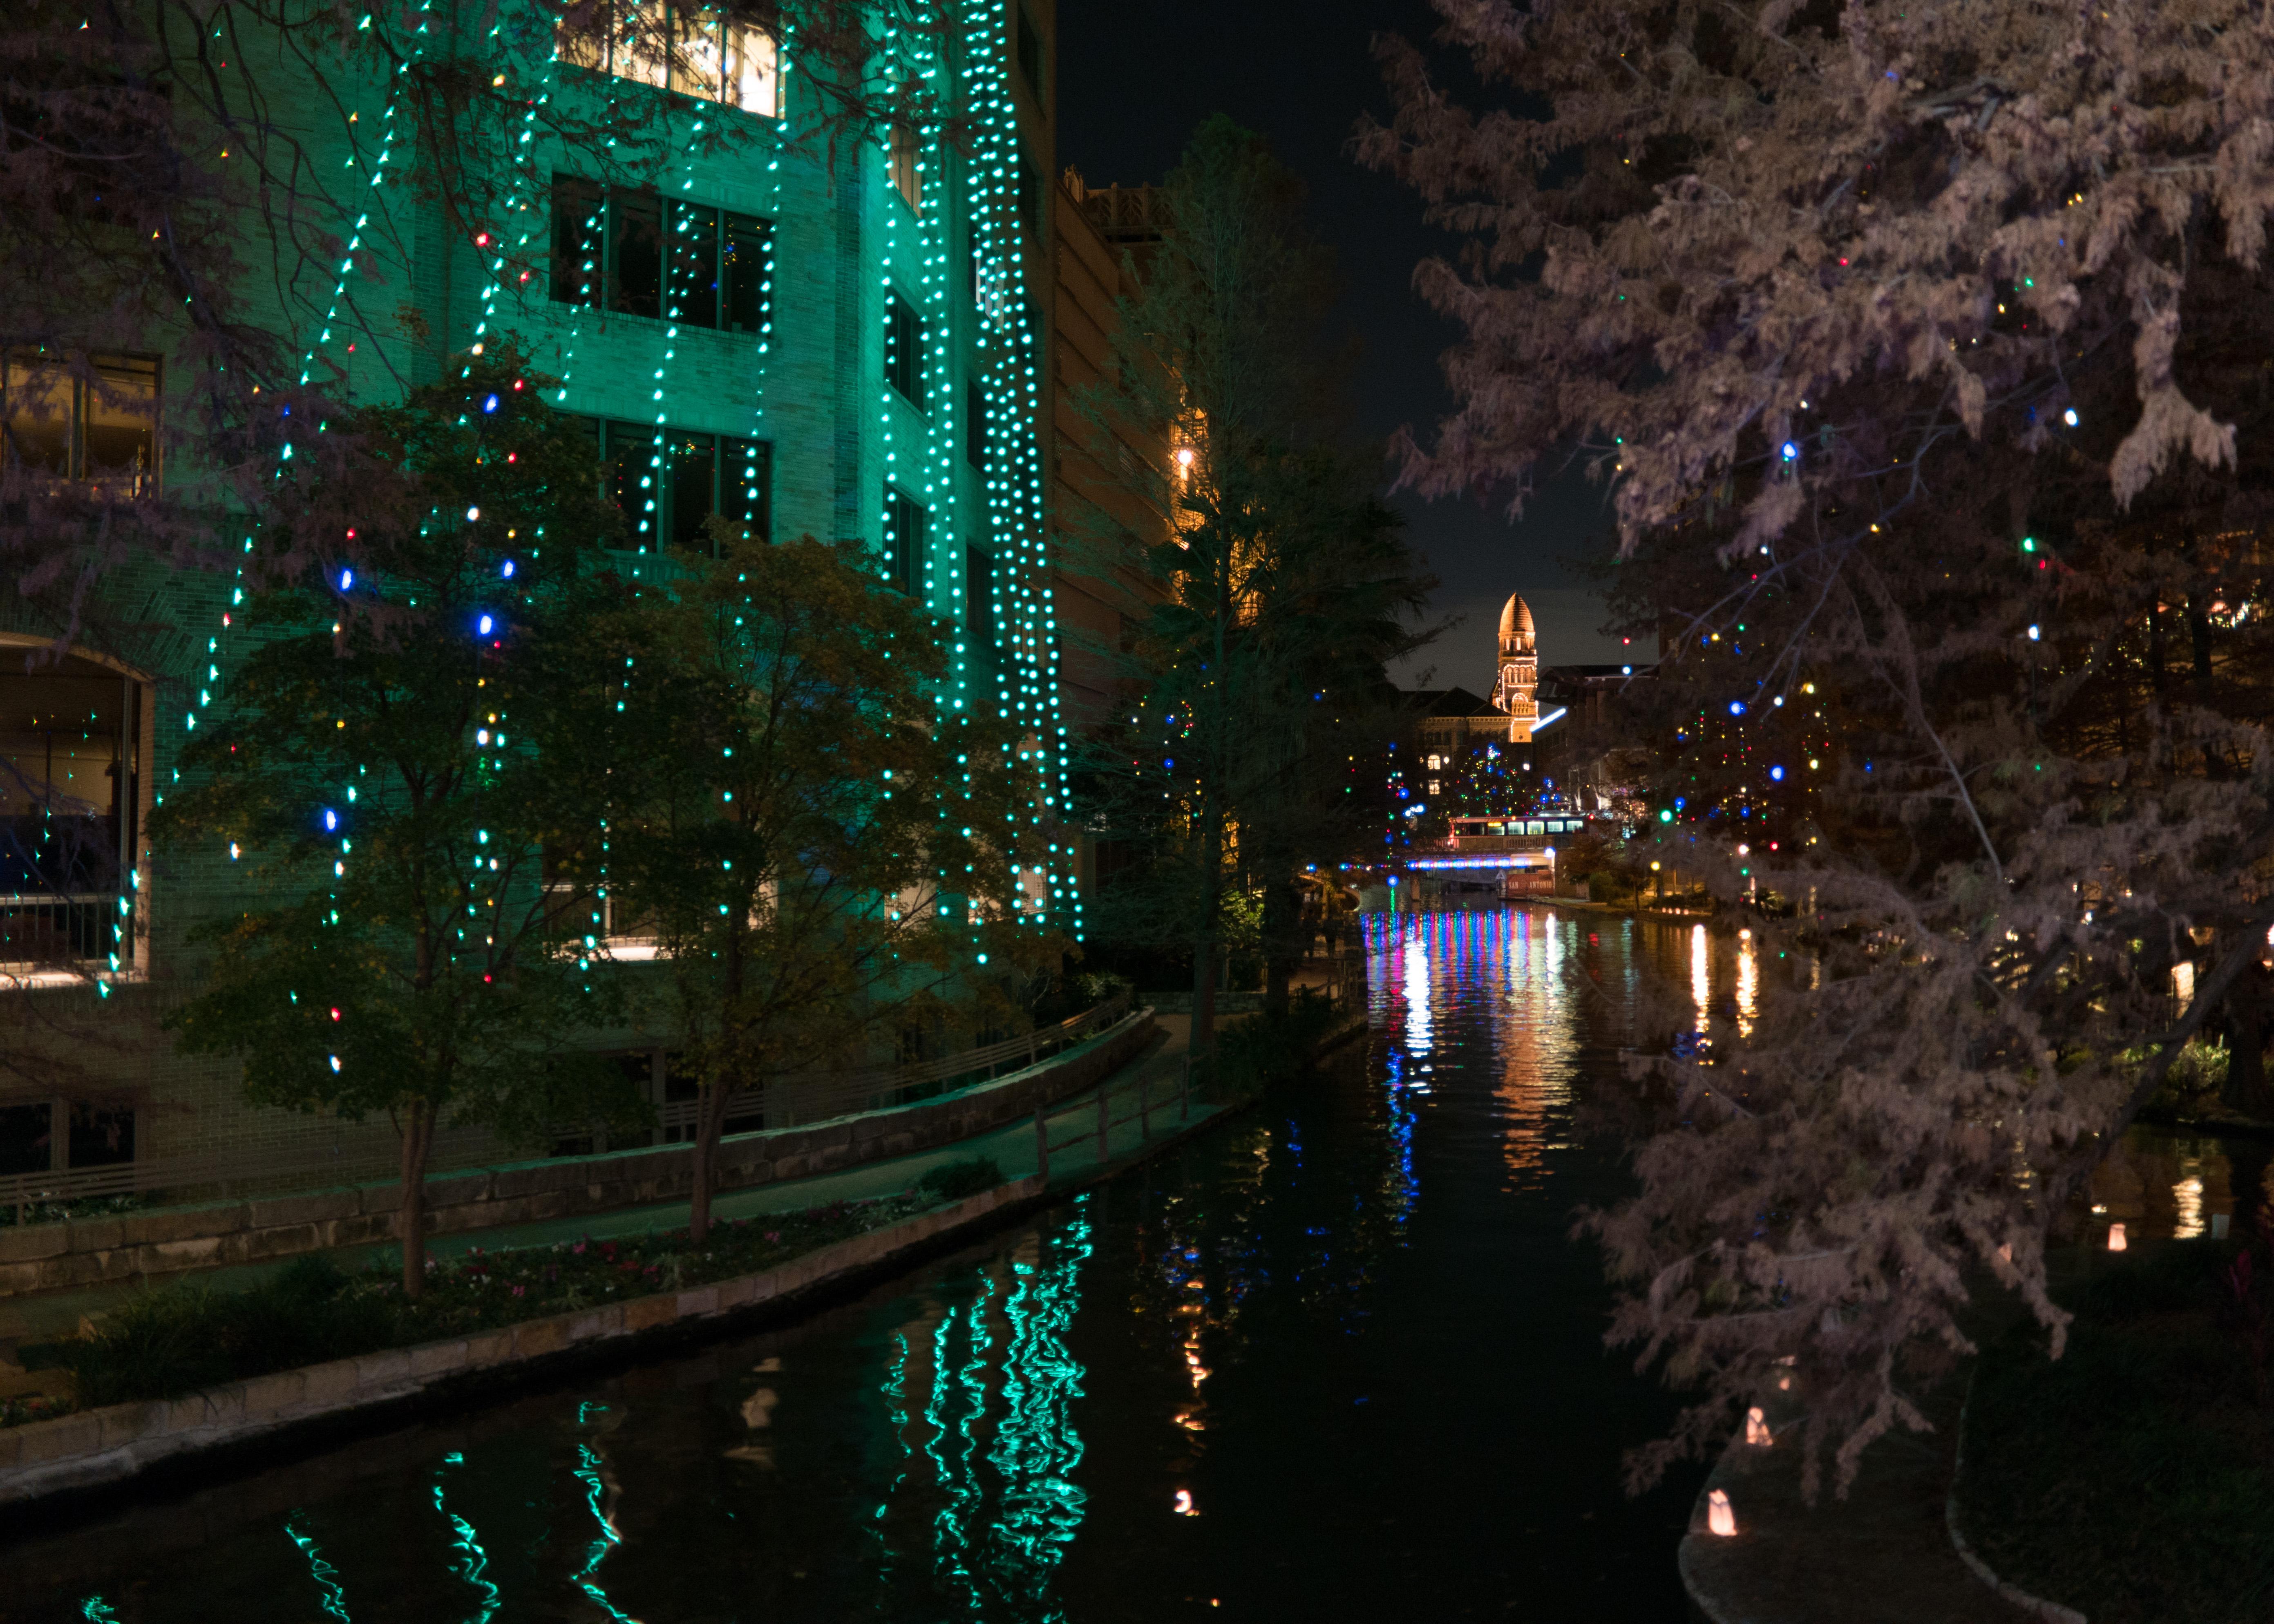 San Antonio Riverwalk Christmas.File San Antonio Riverwalk At Night With Christmas Lights